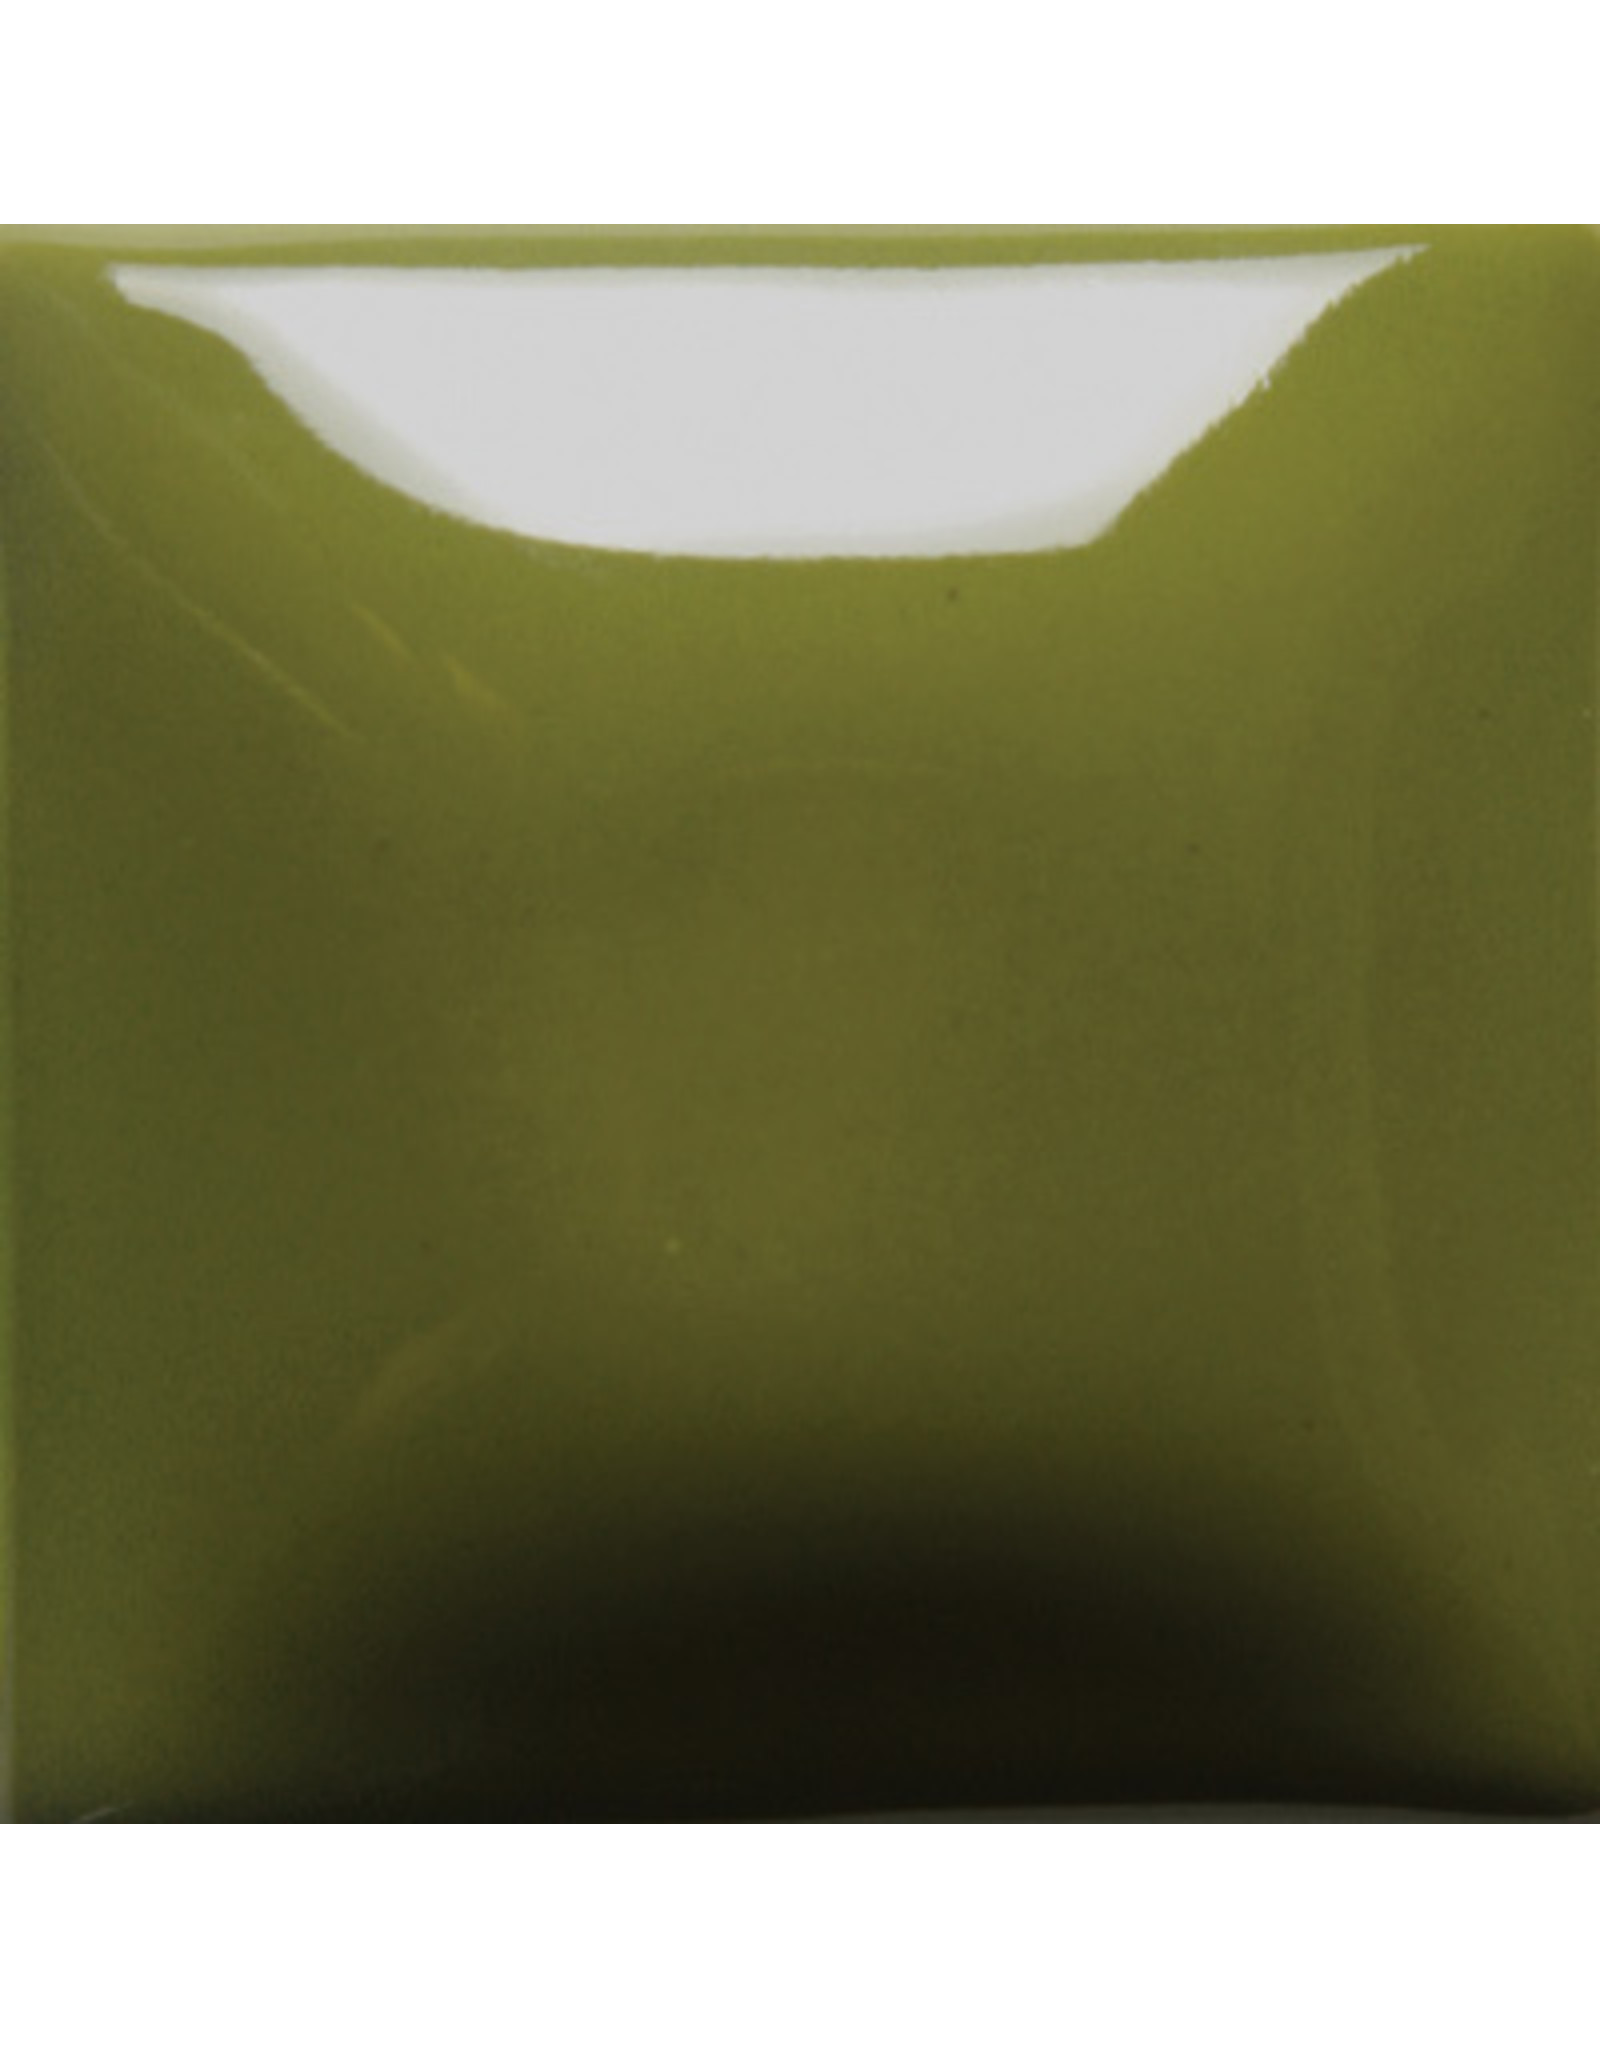 Mayco Mayco Foundations Olive Green 473ml